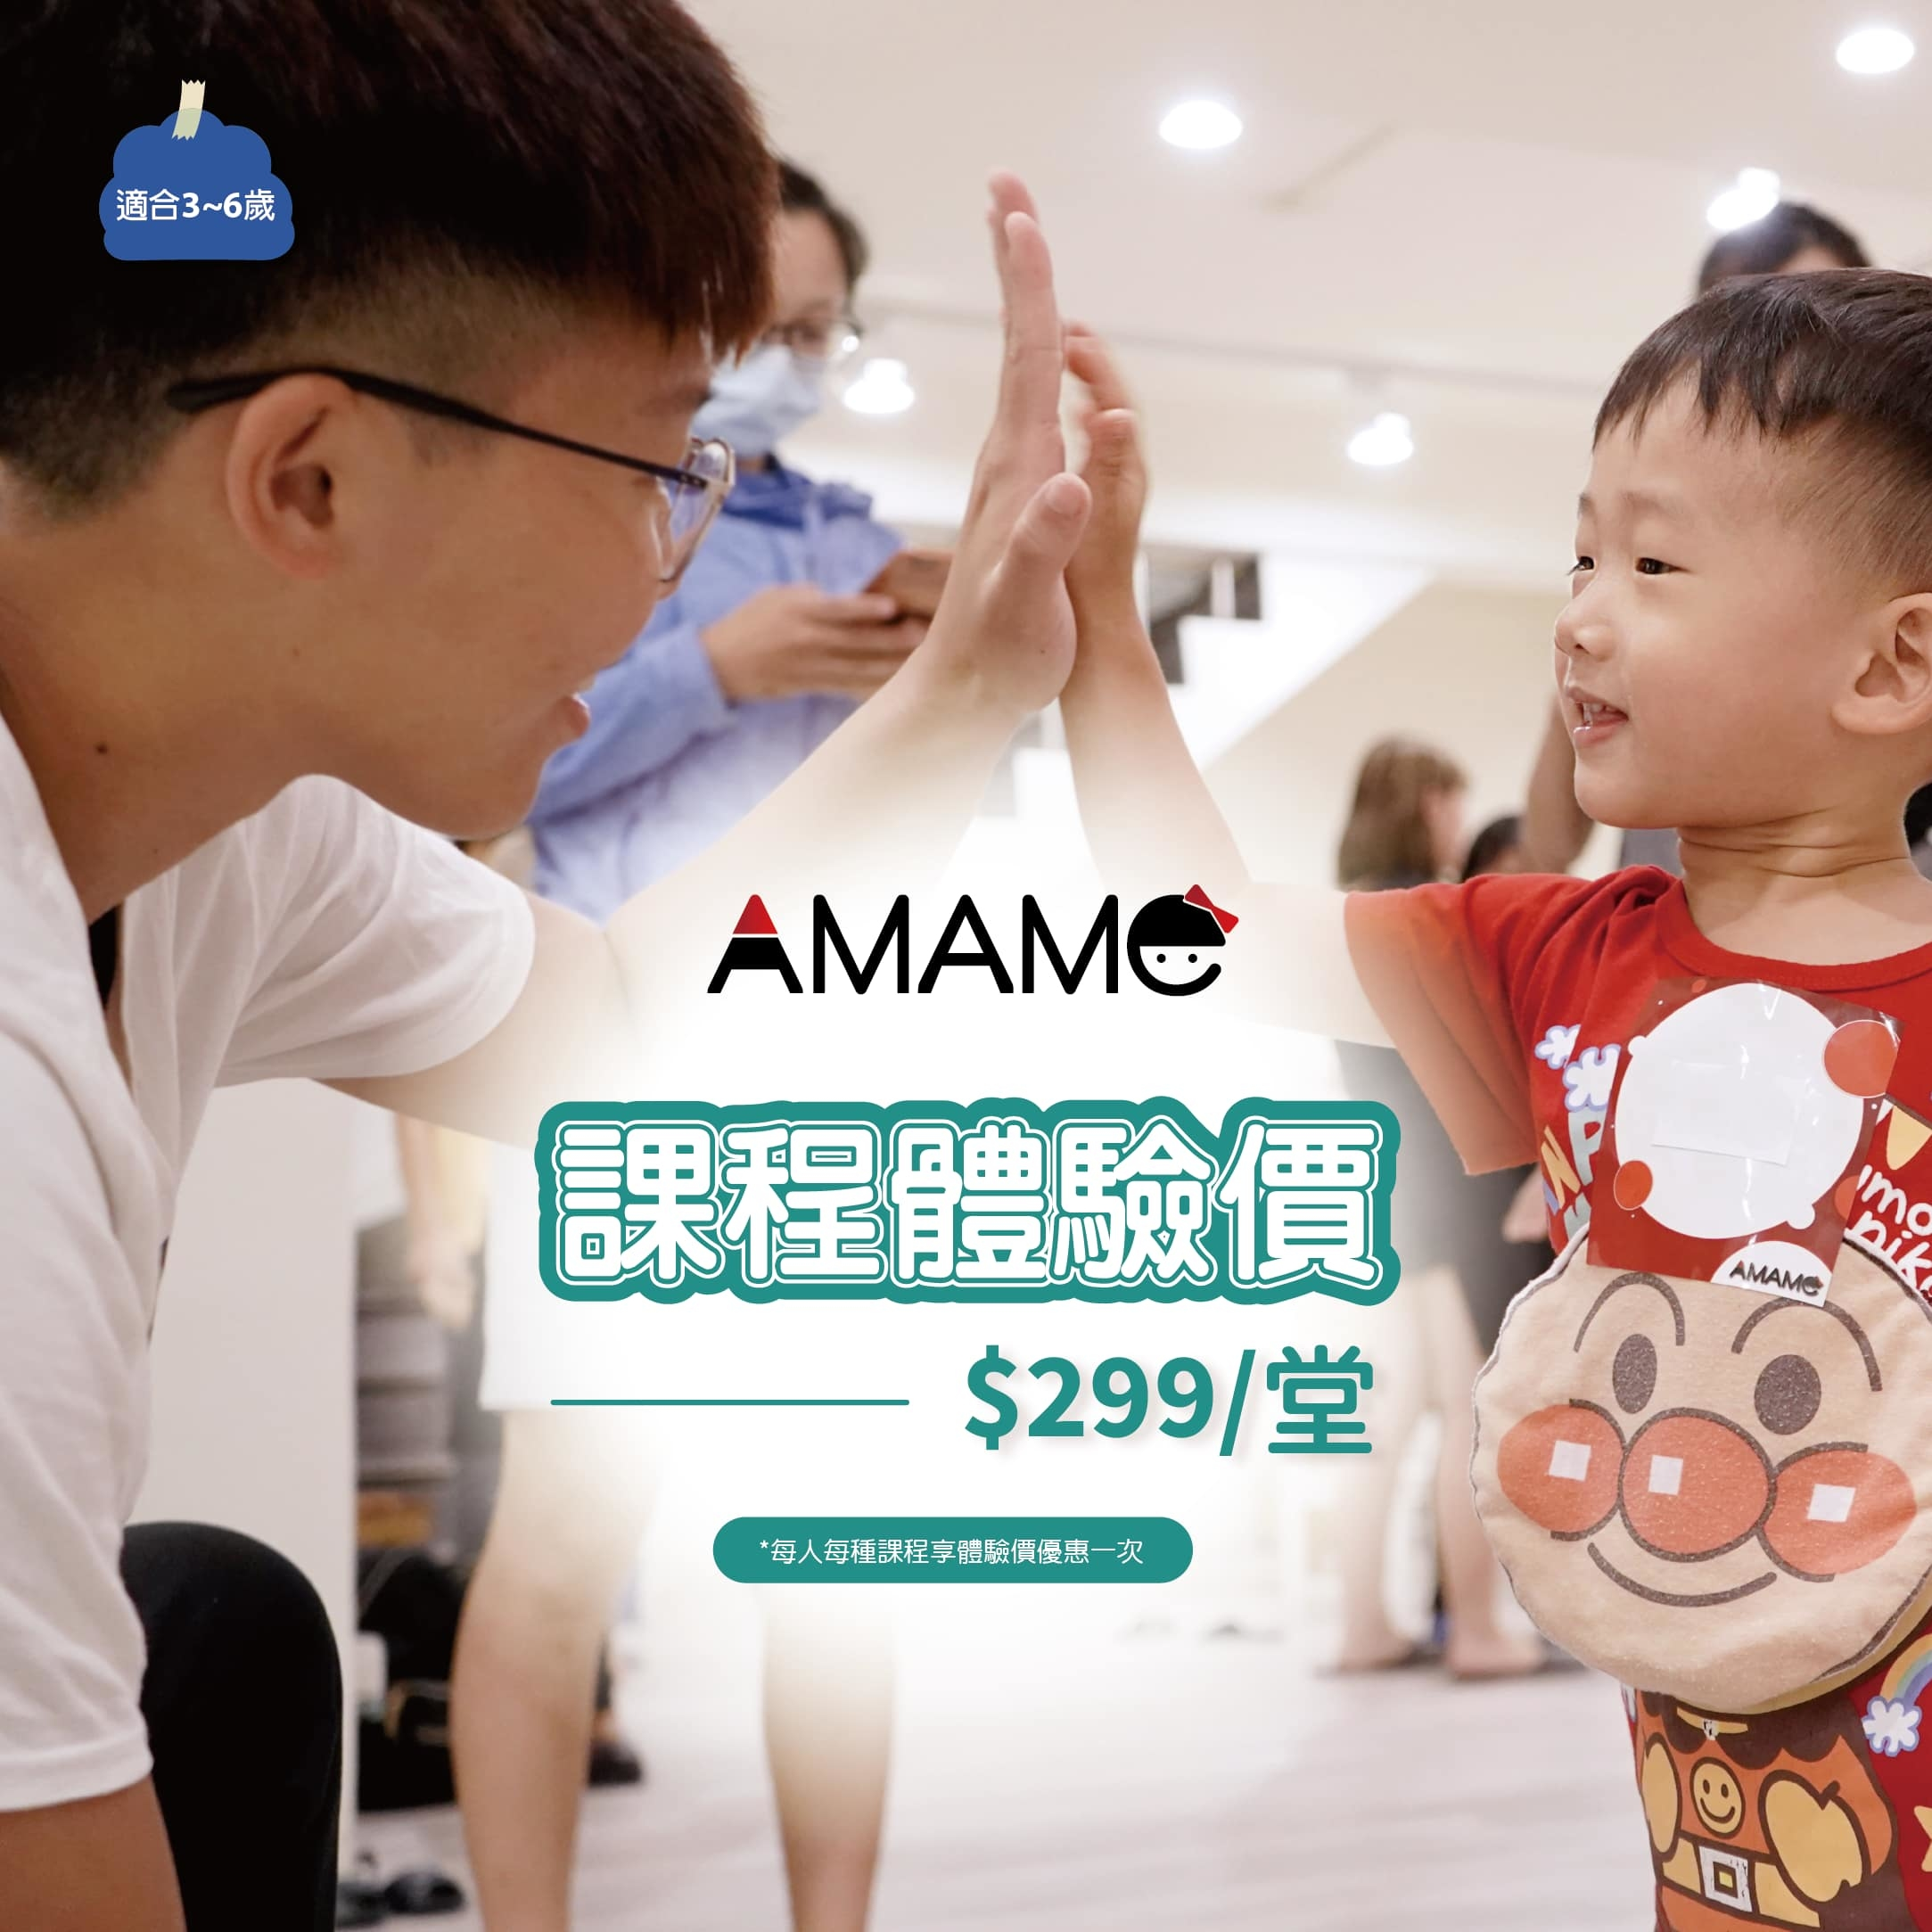 AMaMe課程體驗價299